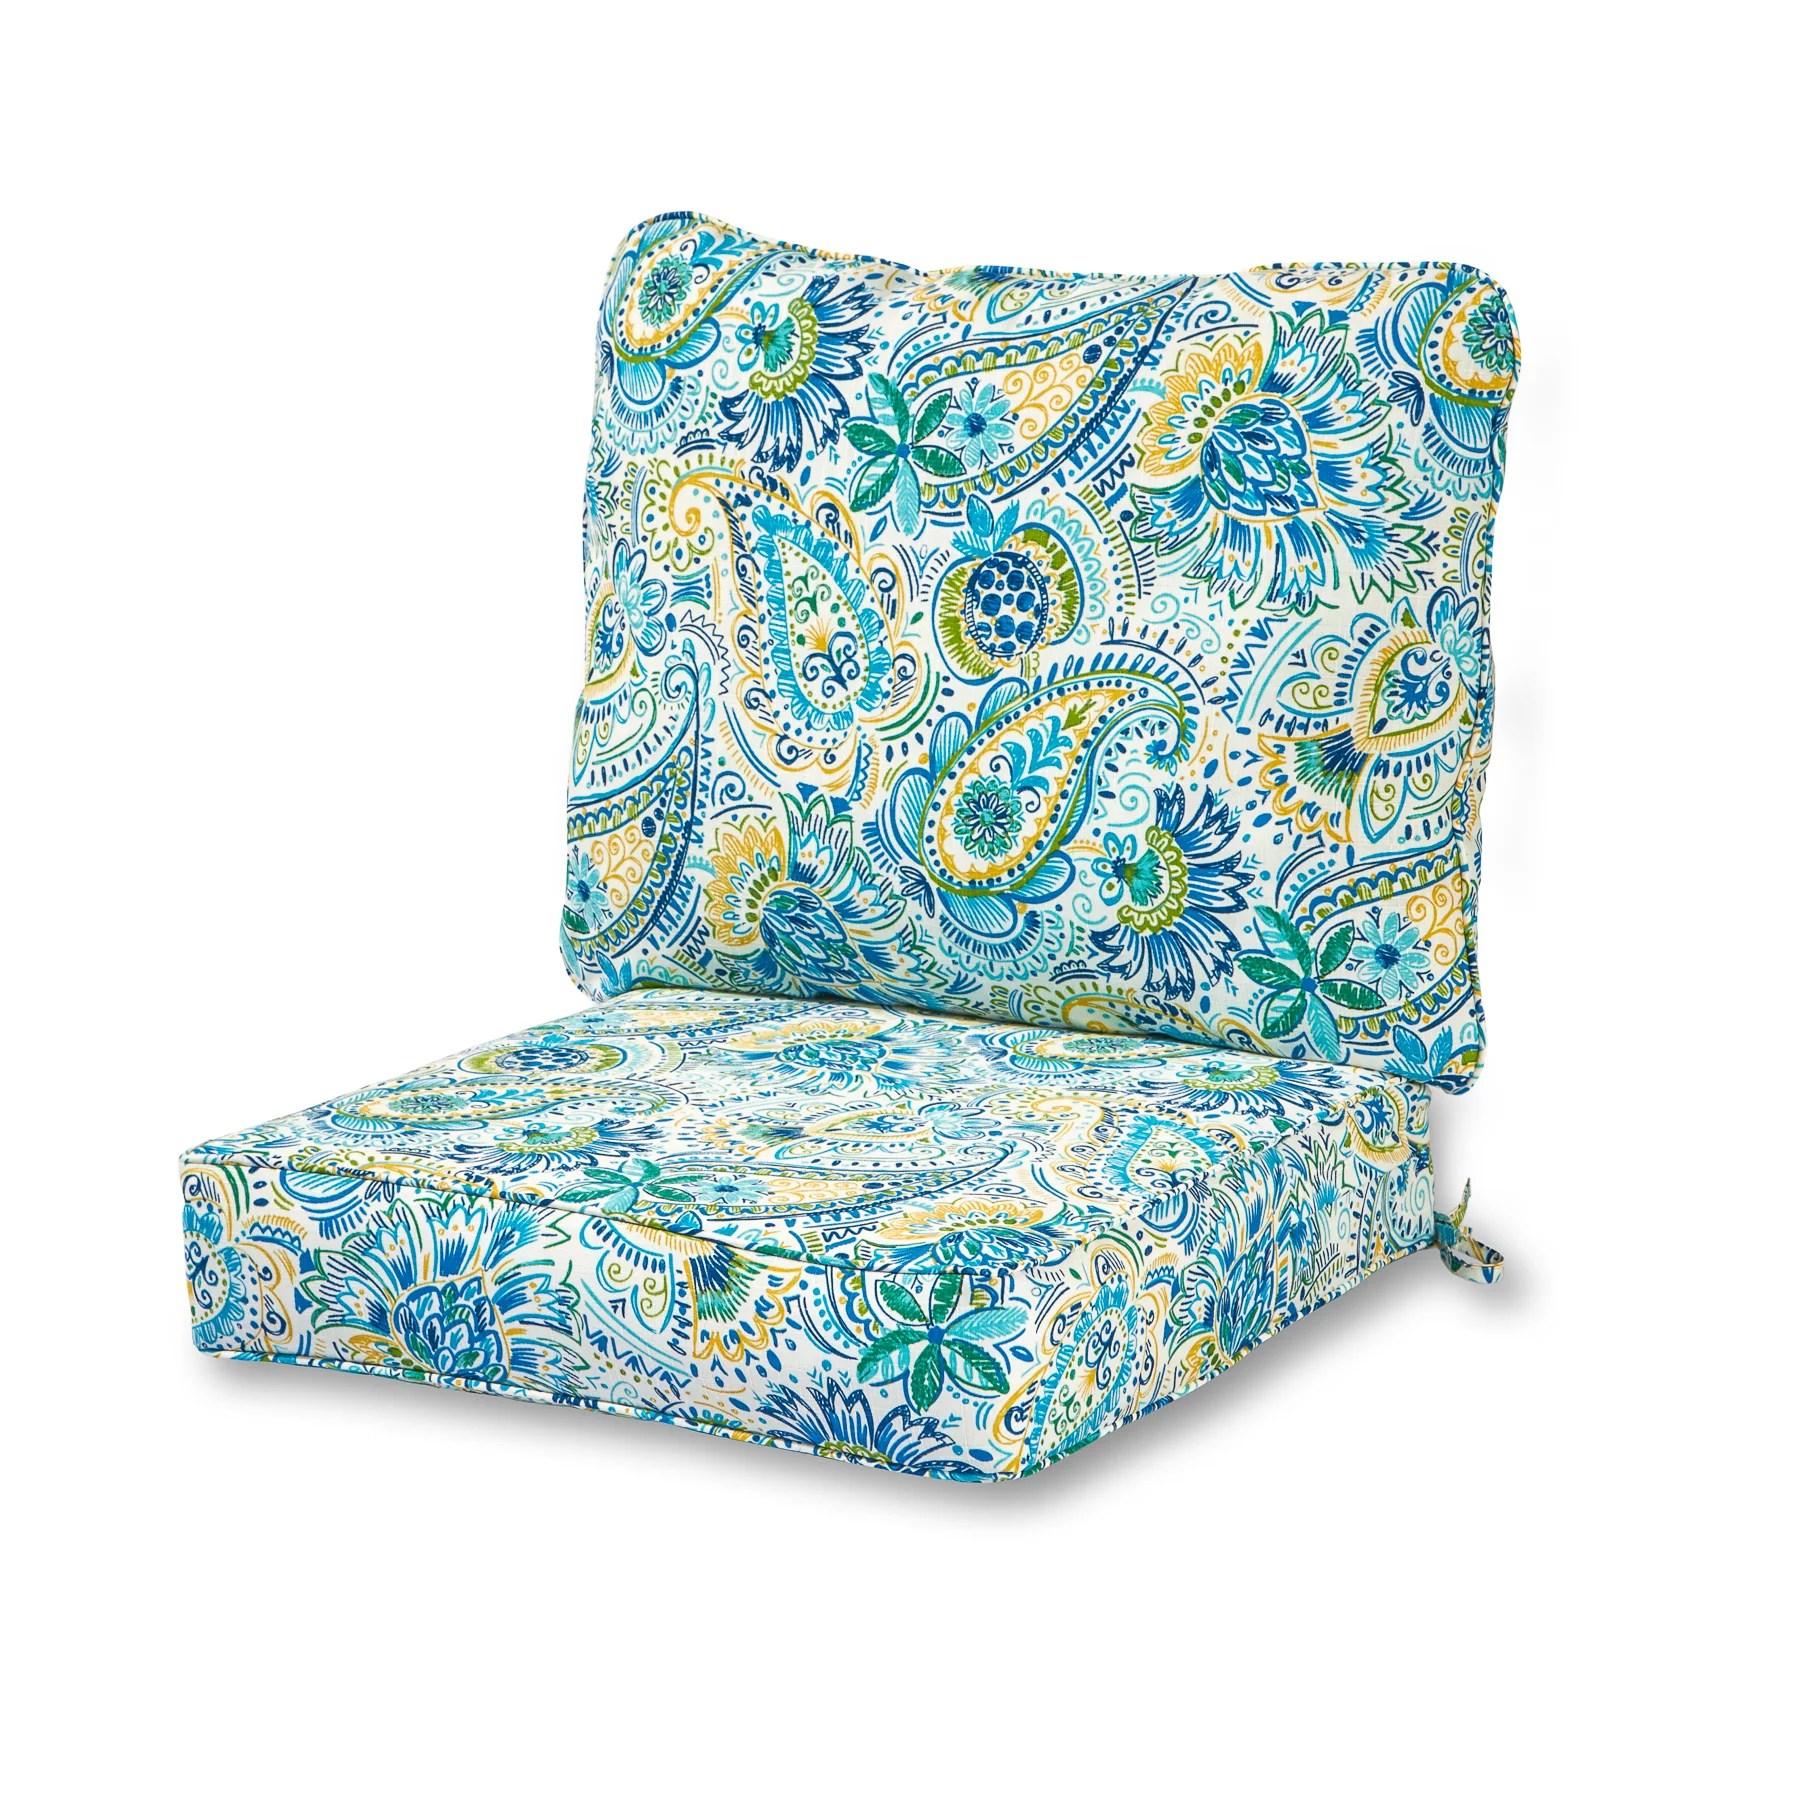 greendale home fashions outdoor 2 piece deep seat cushion set baltic paisley